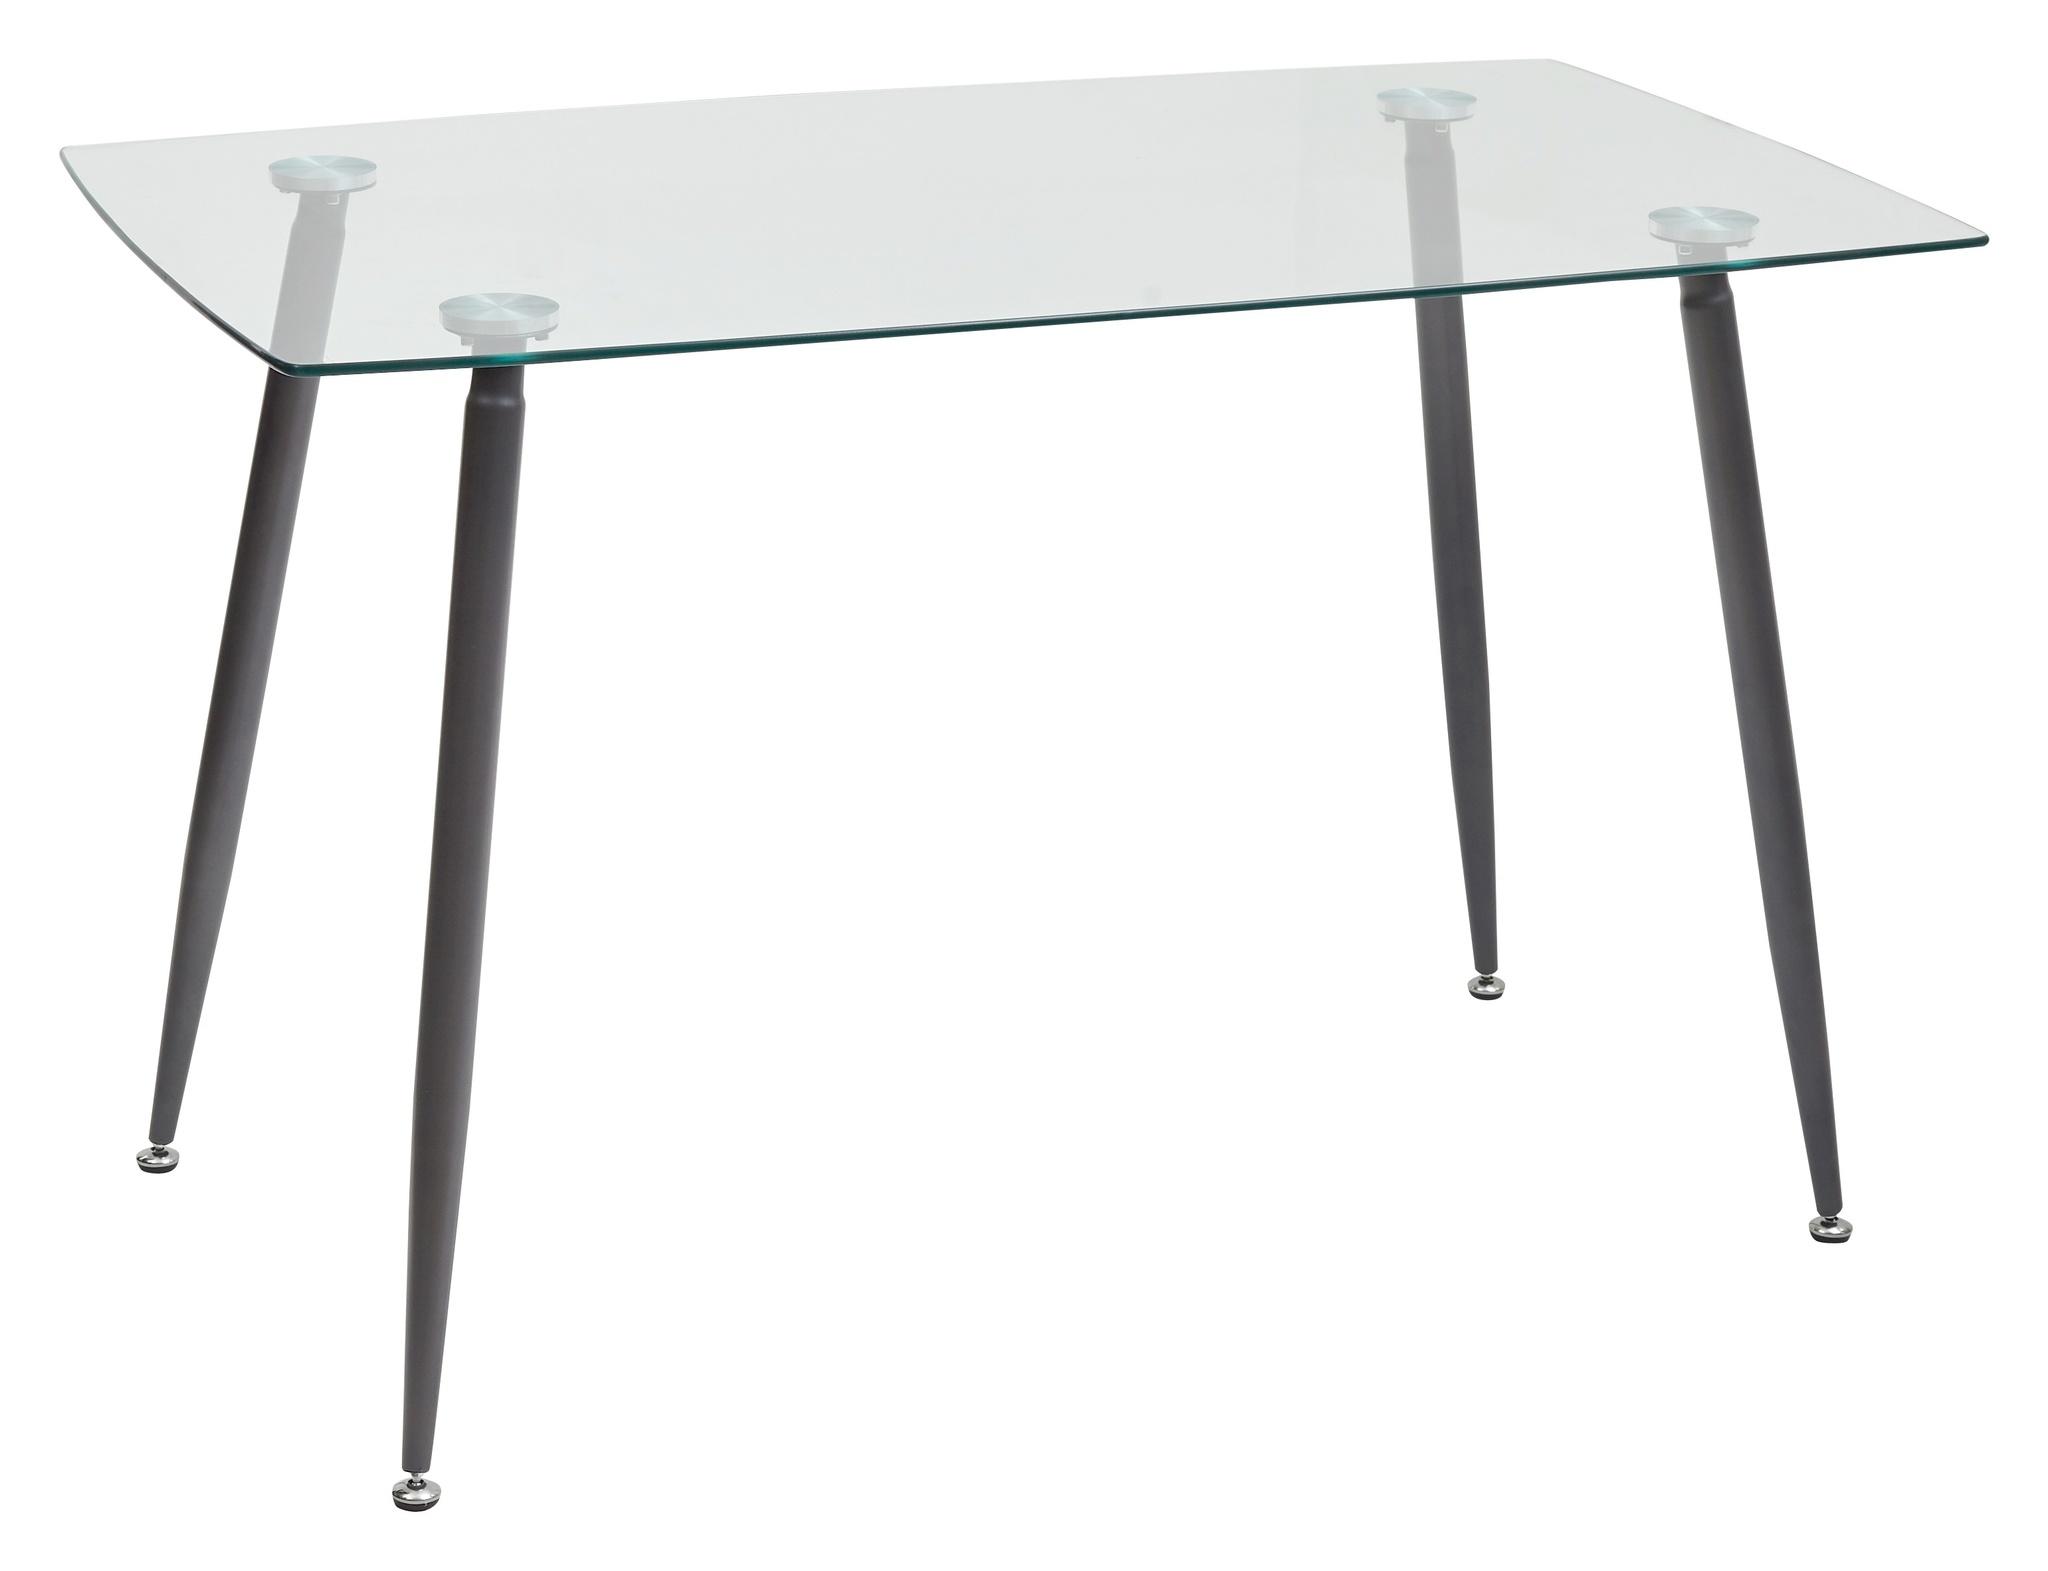 TABLE RECTANGULAR RON 120 TRANSPARENT (120 X 70 CM.)